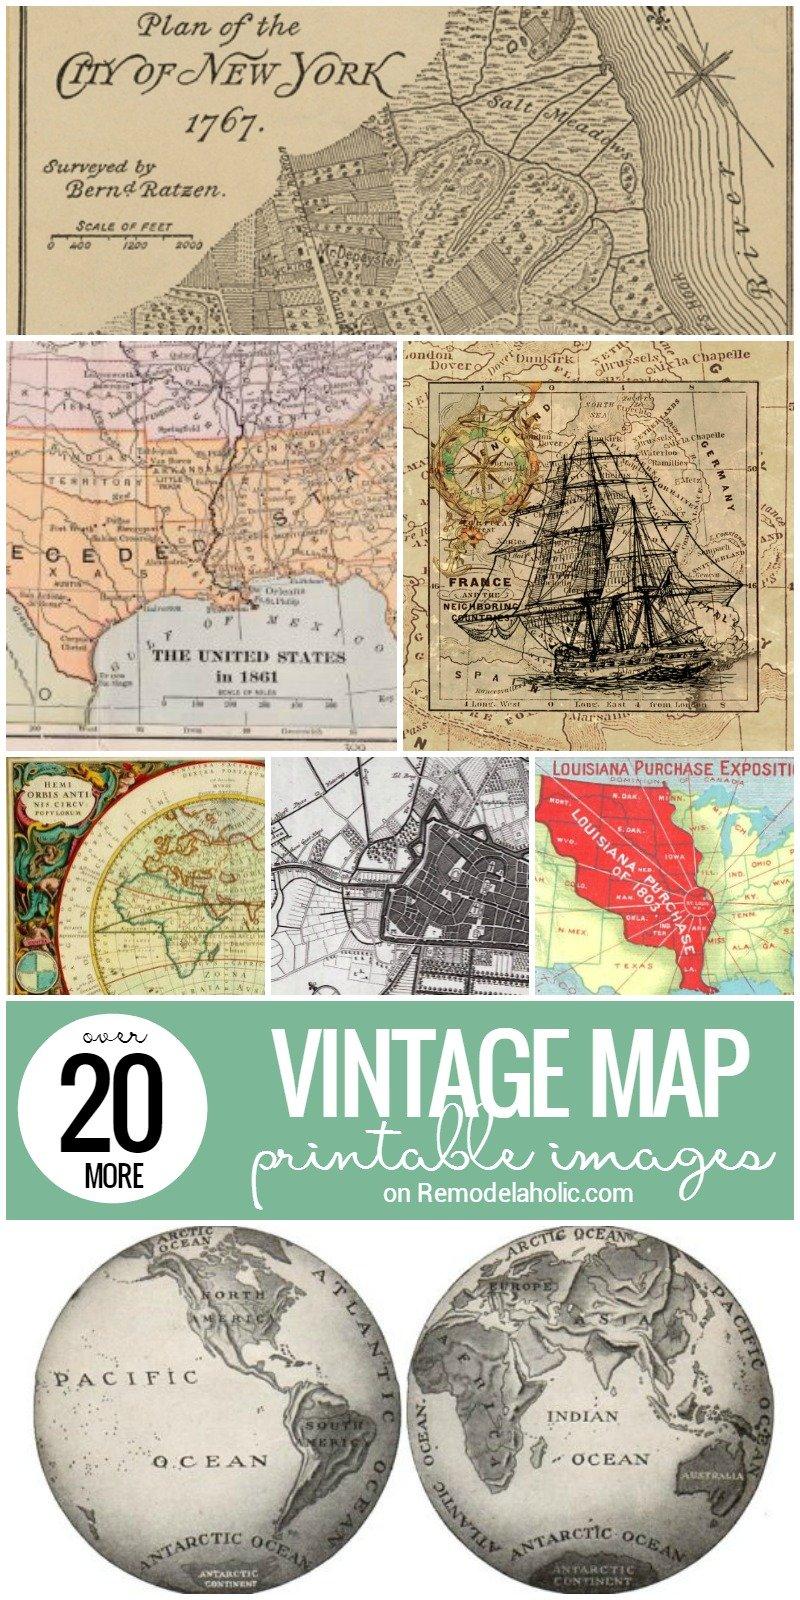 remodelaholic 20 more free printable vintage map images